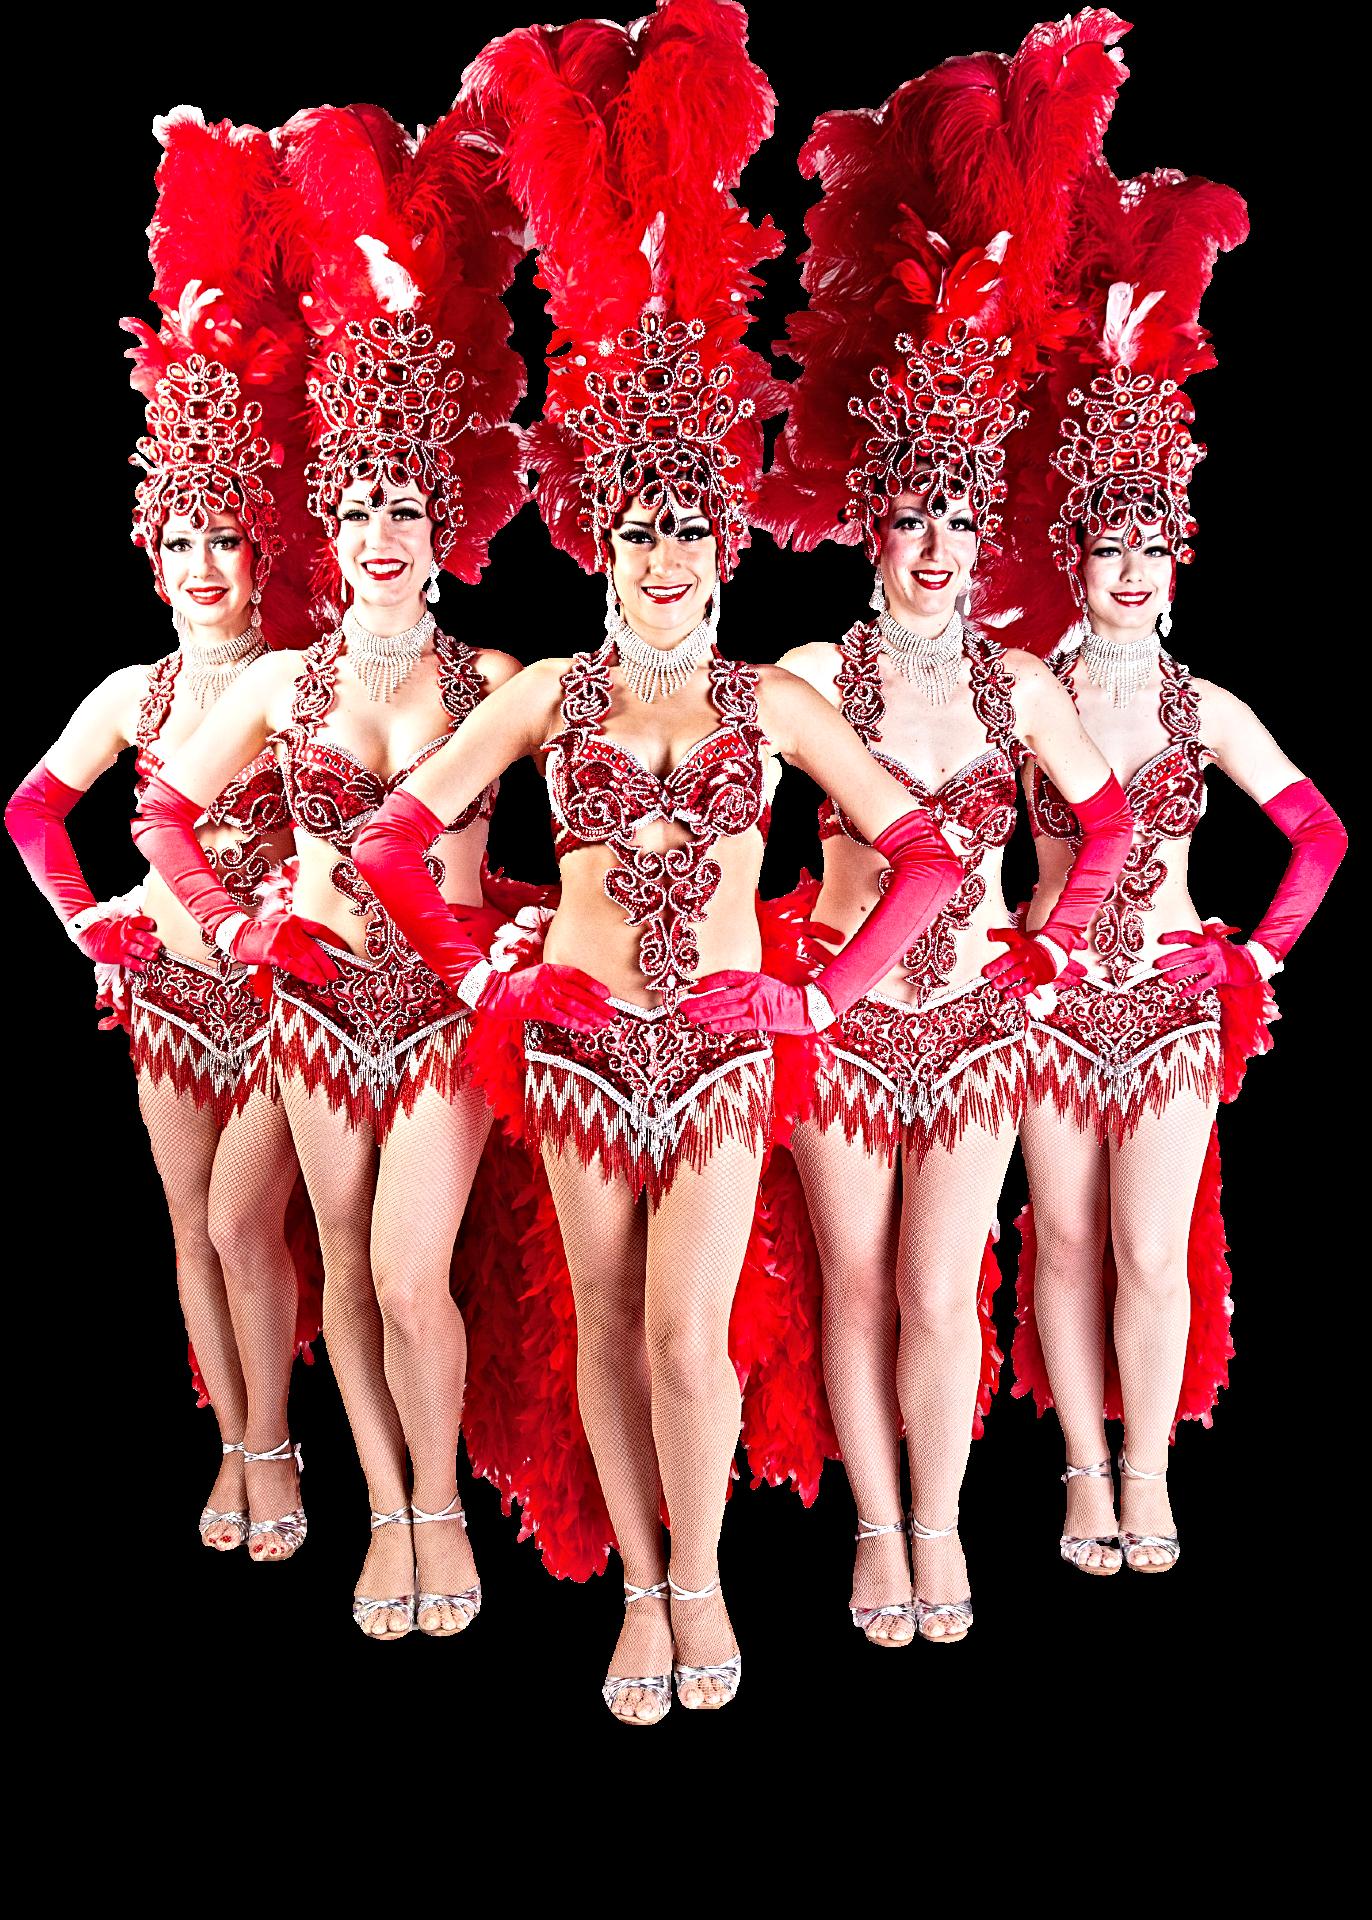 showgirls,vegas,wedding,rsdivas,tdc,